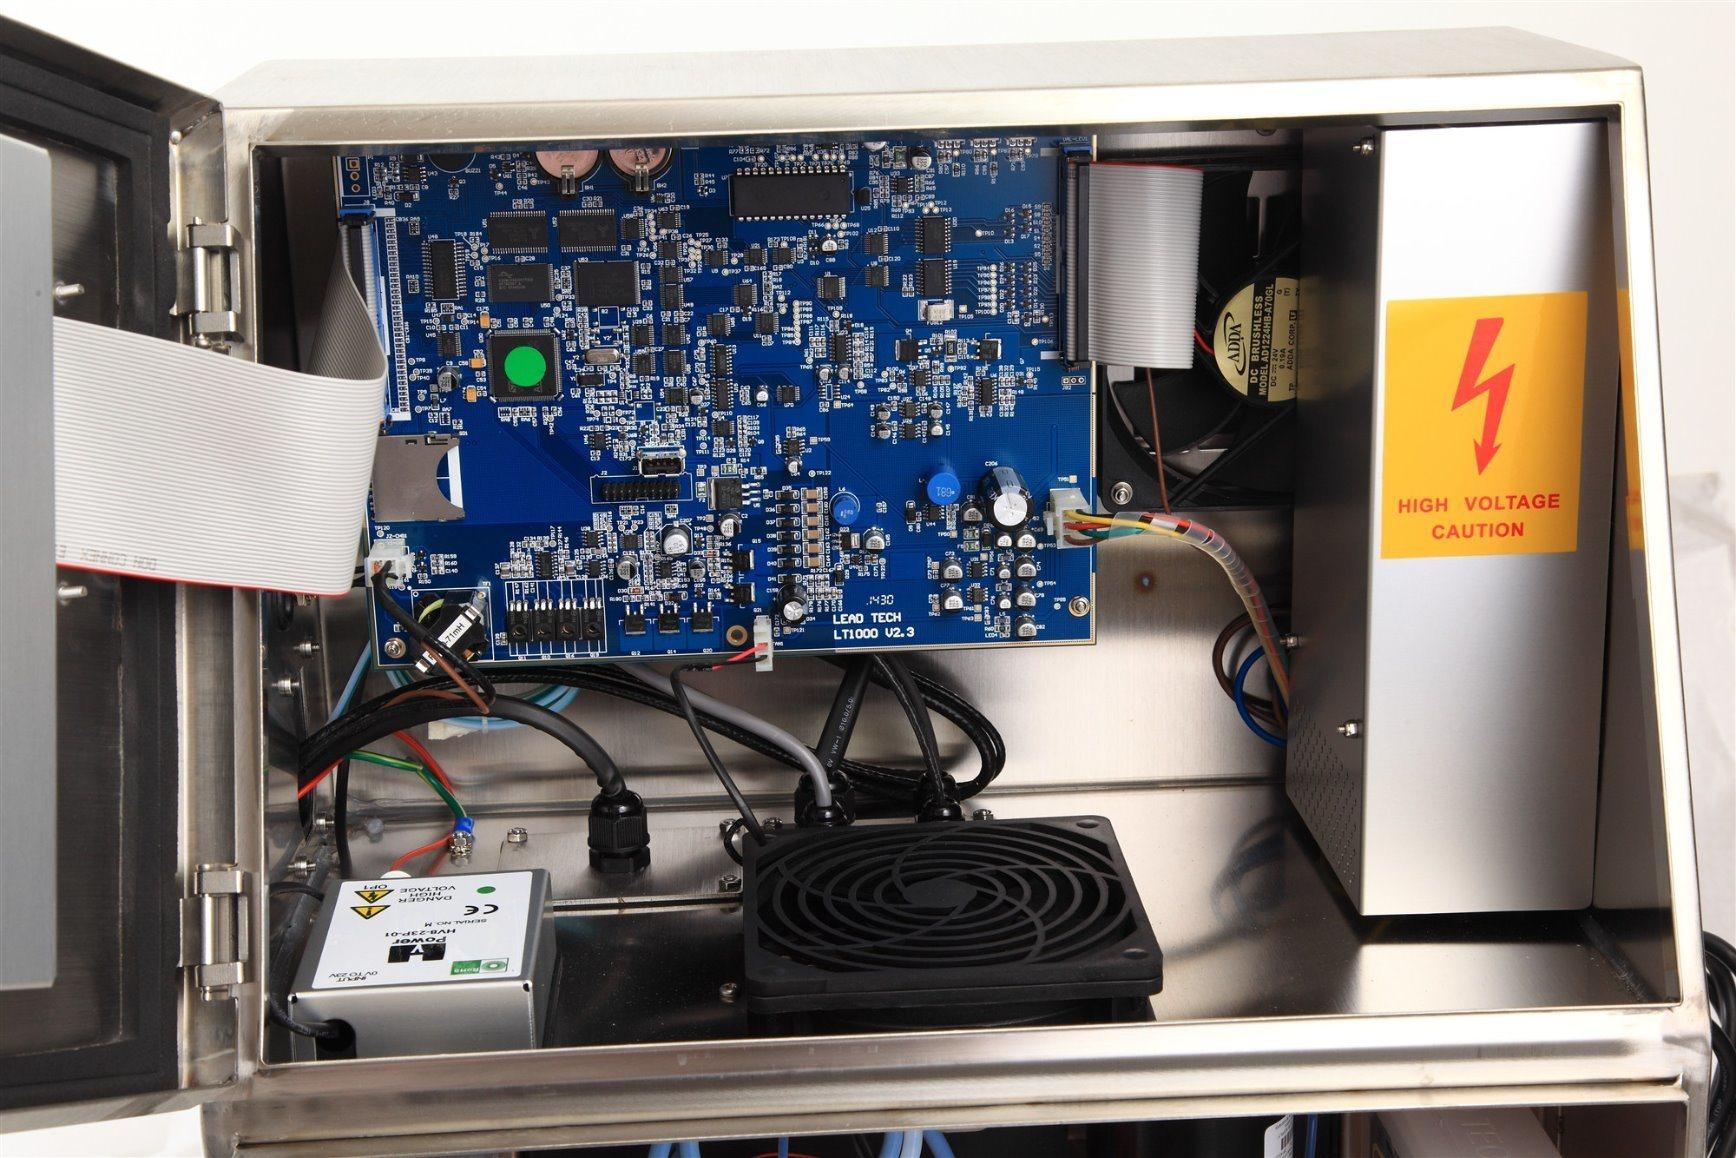 Lead Tech Lt1000s+ Tuna Can Coding Cij Inkjet Printer